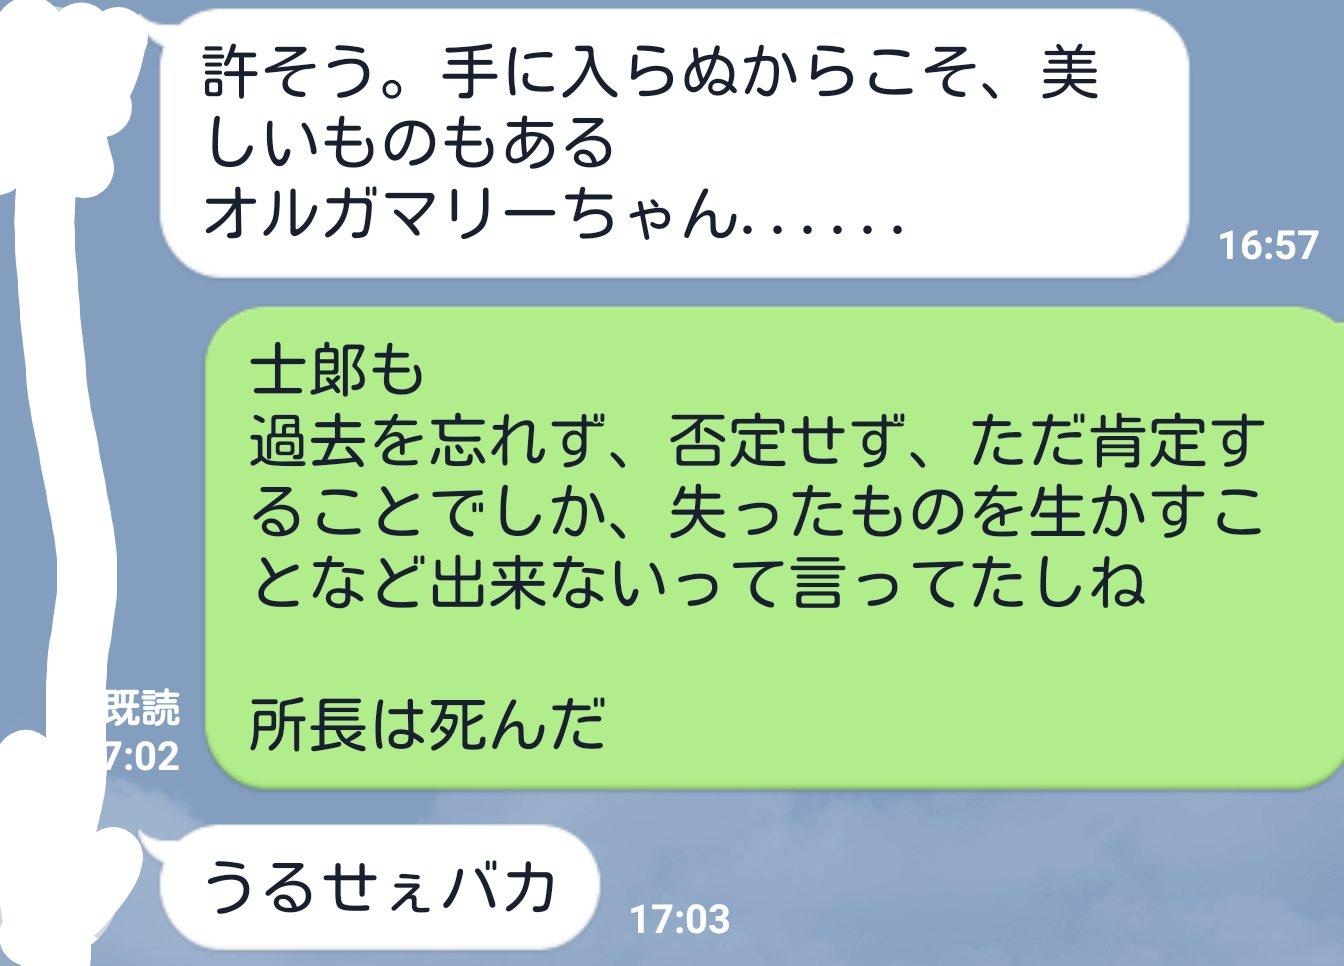 S4SEHef - 【悲報】イキり鯖太郎「母にFGO勧めた結果をご査収ください」→4.3万いいね